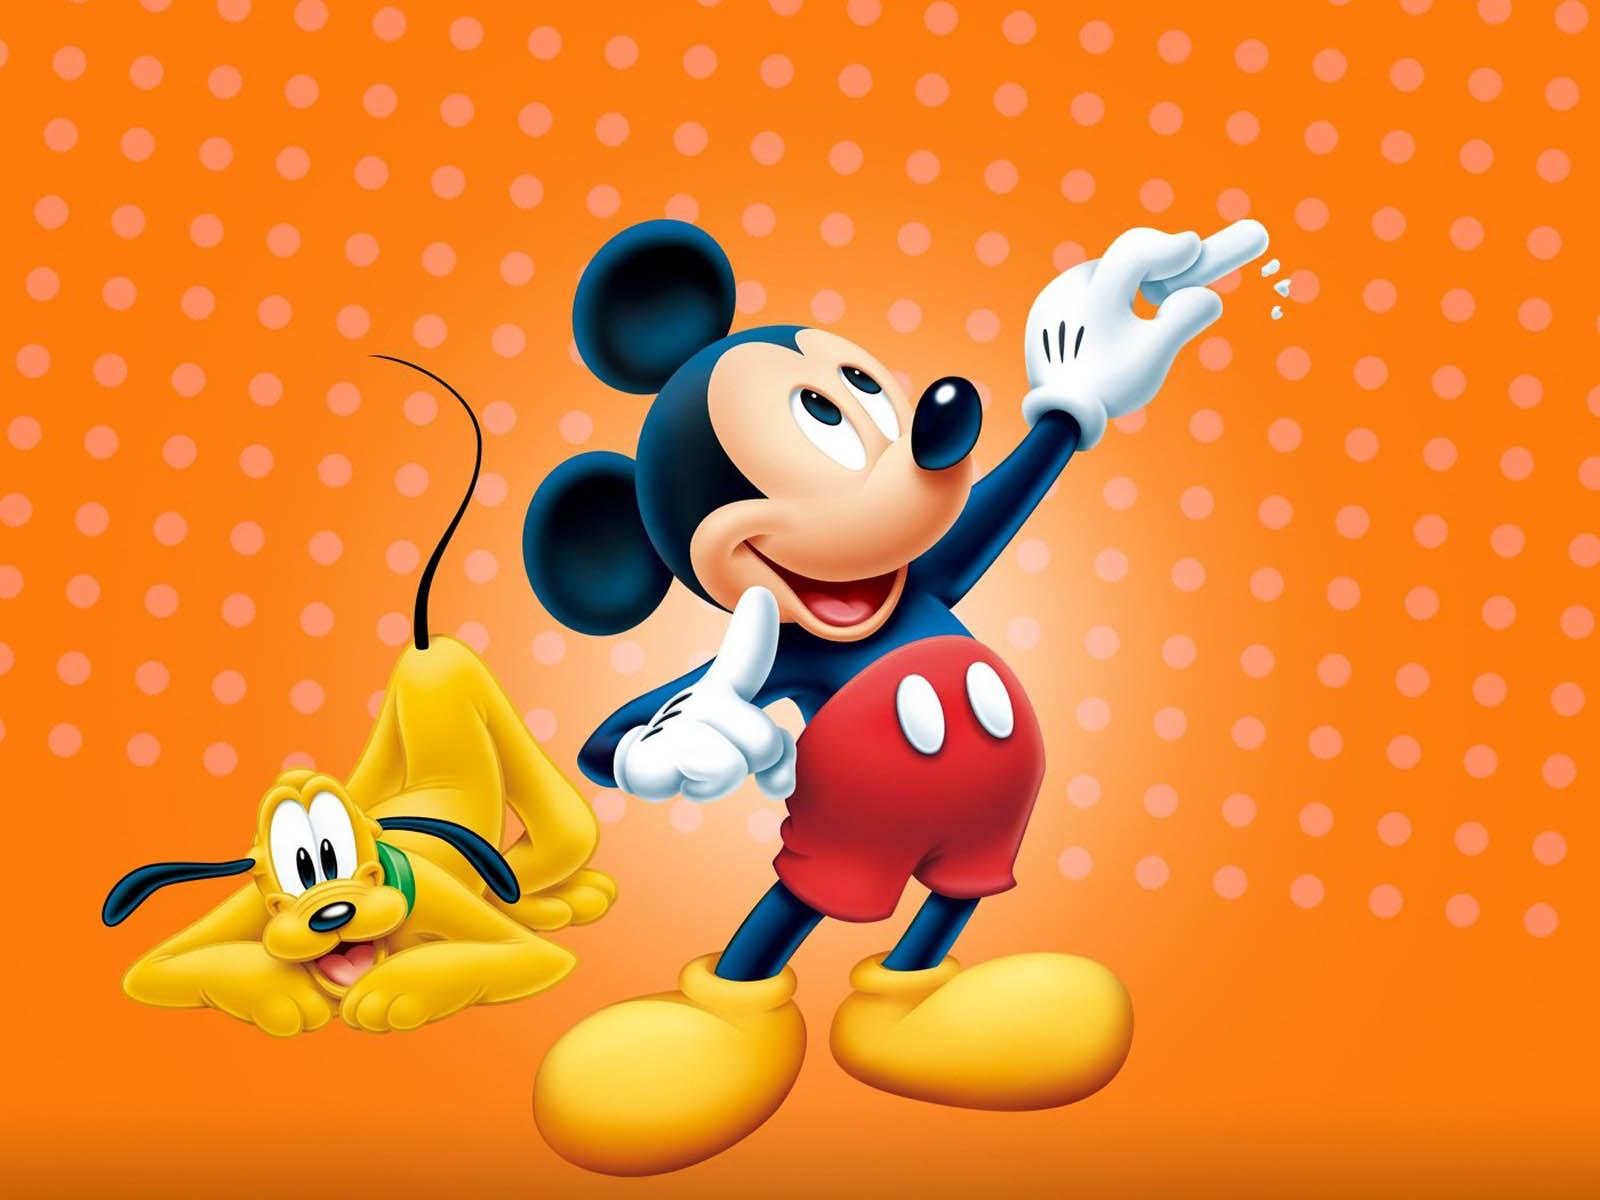 Letest Motu Patalu HD wallpapers Get free high definition cartoon desktop wallpapers - Top Free ...